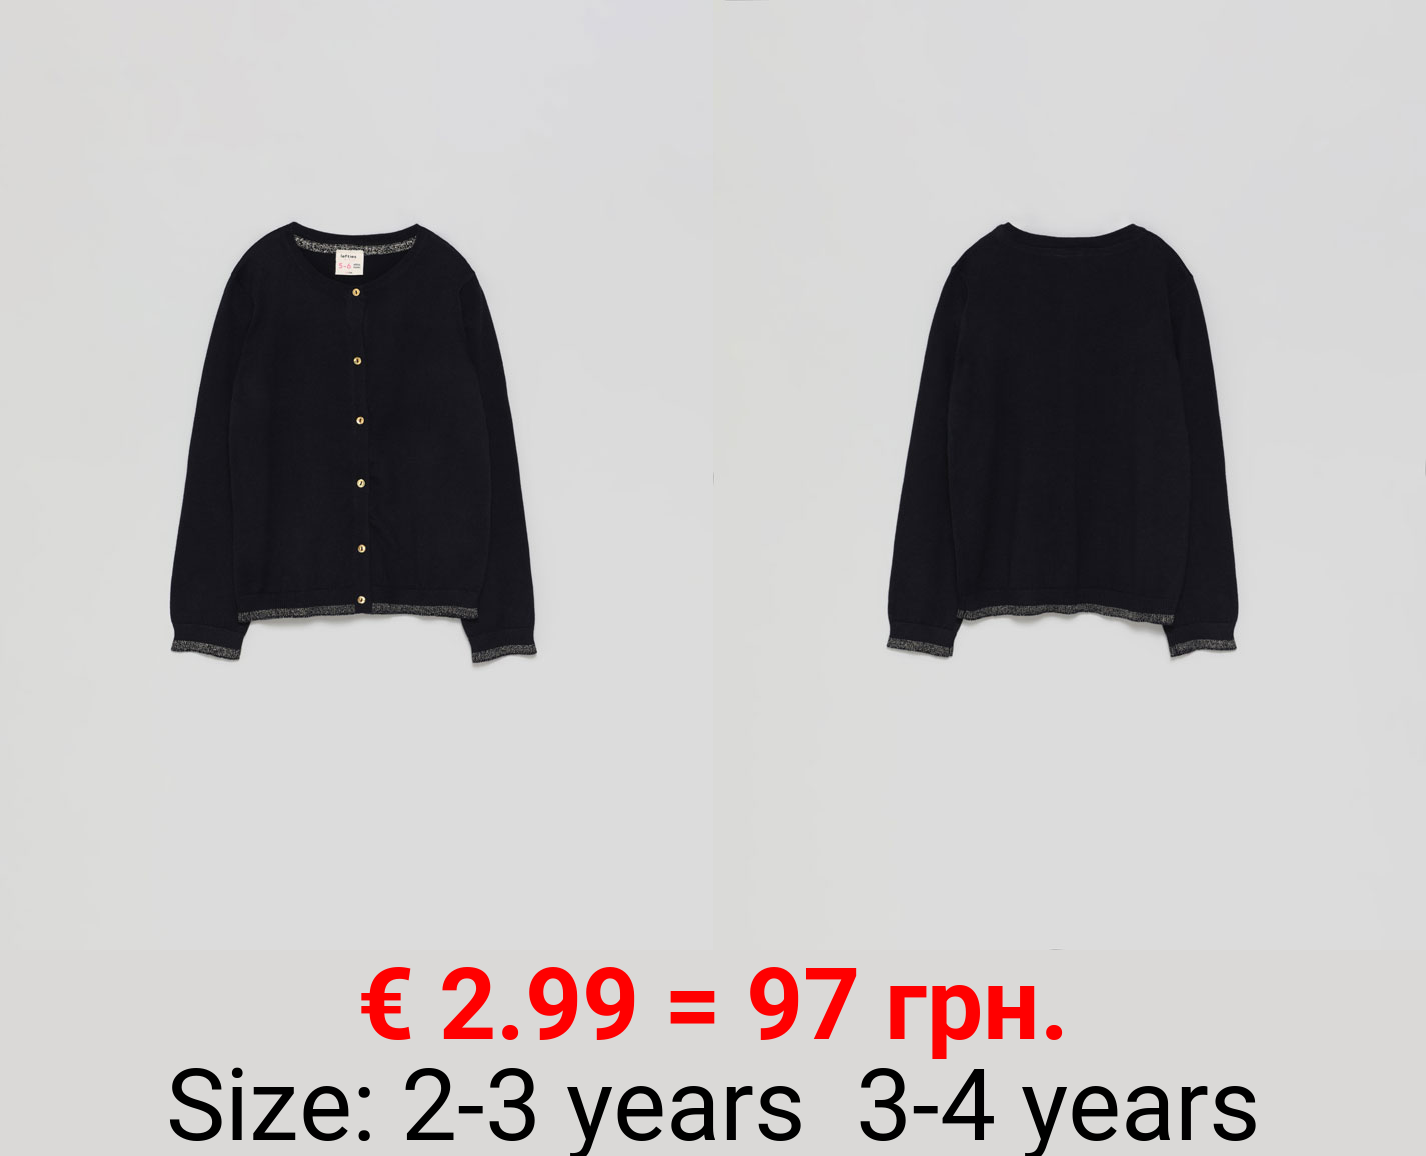 Basic fine knit cardigan